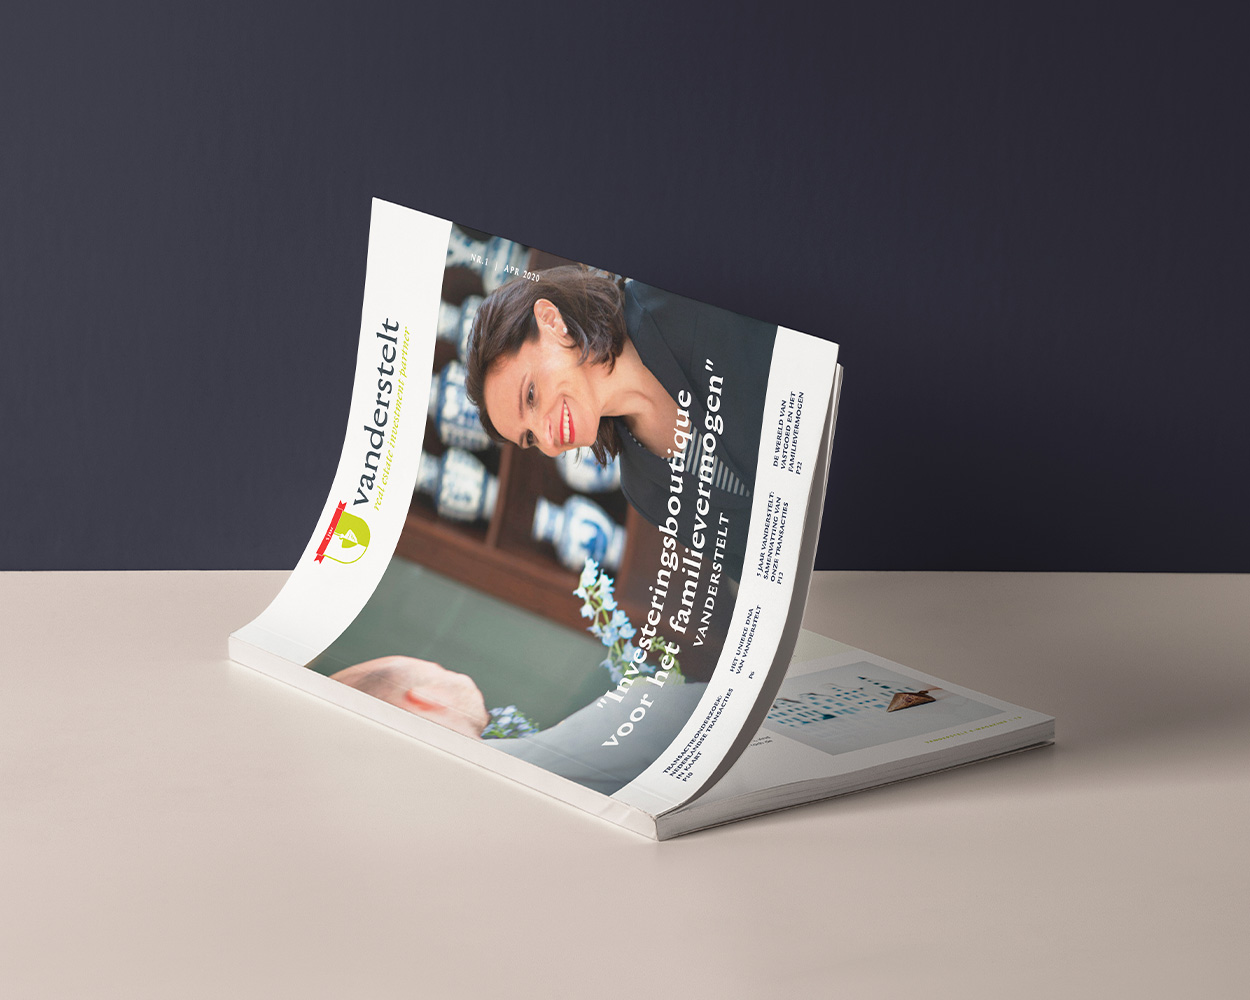 VANDERSTELT - E-magazine editie 1